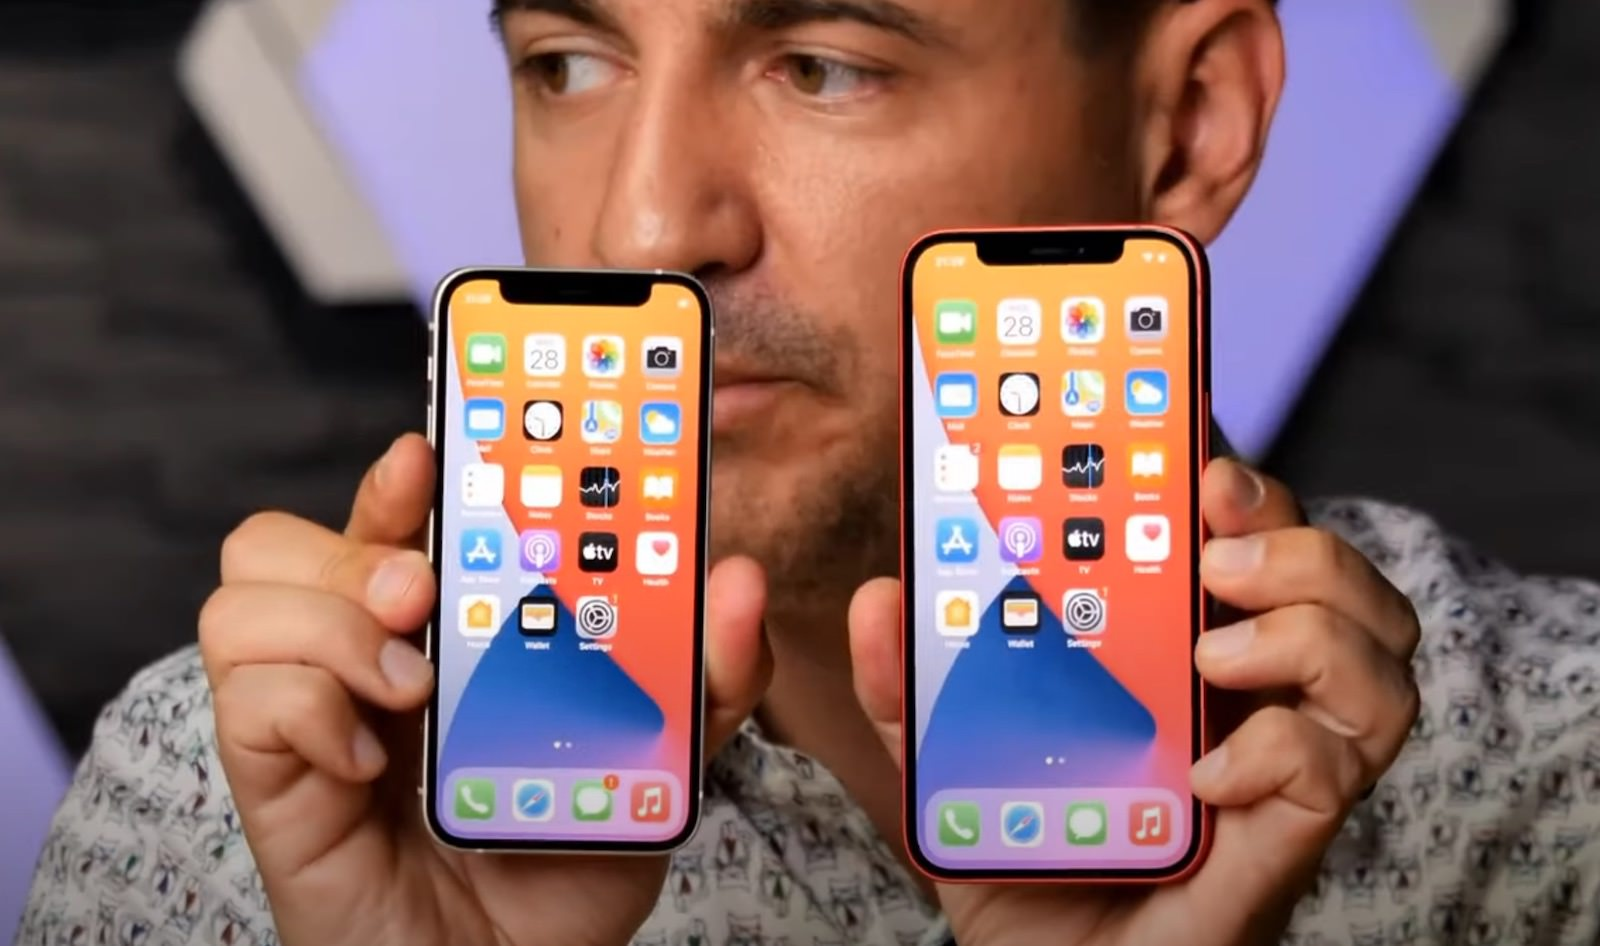 george-buhnici-upload-iphone12mini-1.jpg